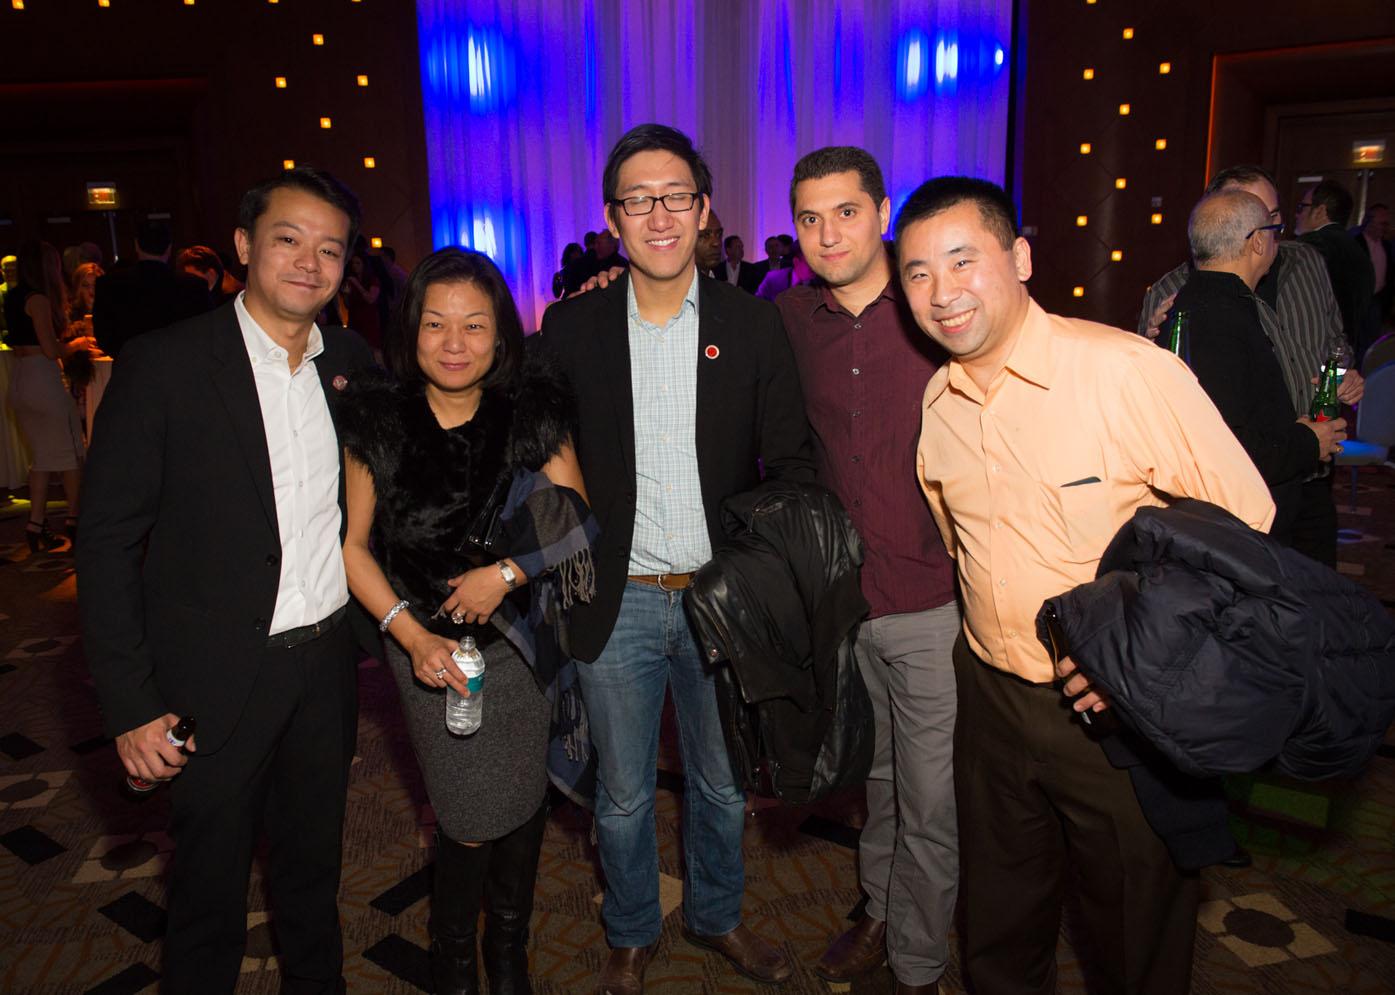 2015-12-09 ReMax Corpoarte Event - The Borgata - Atlantic City NJ - Photo Sesh - 2015-5300.jpg